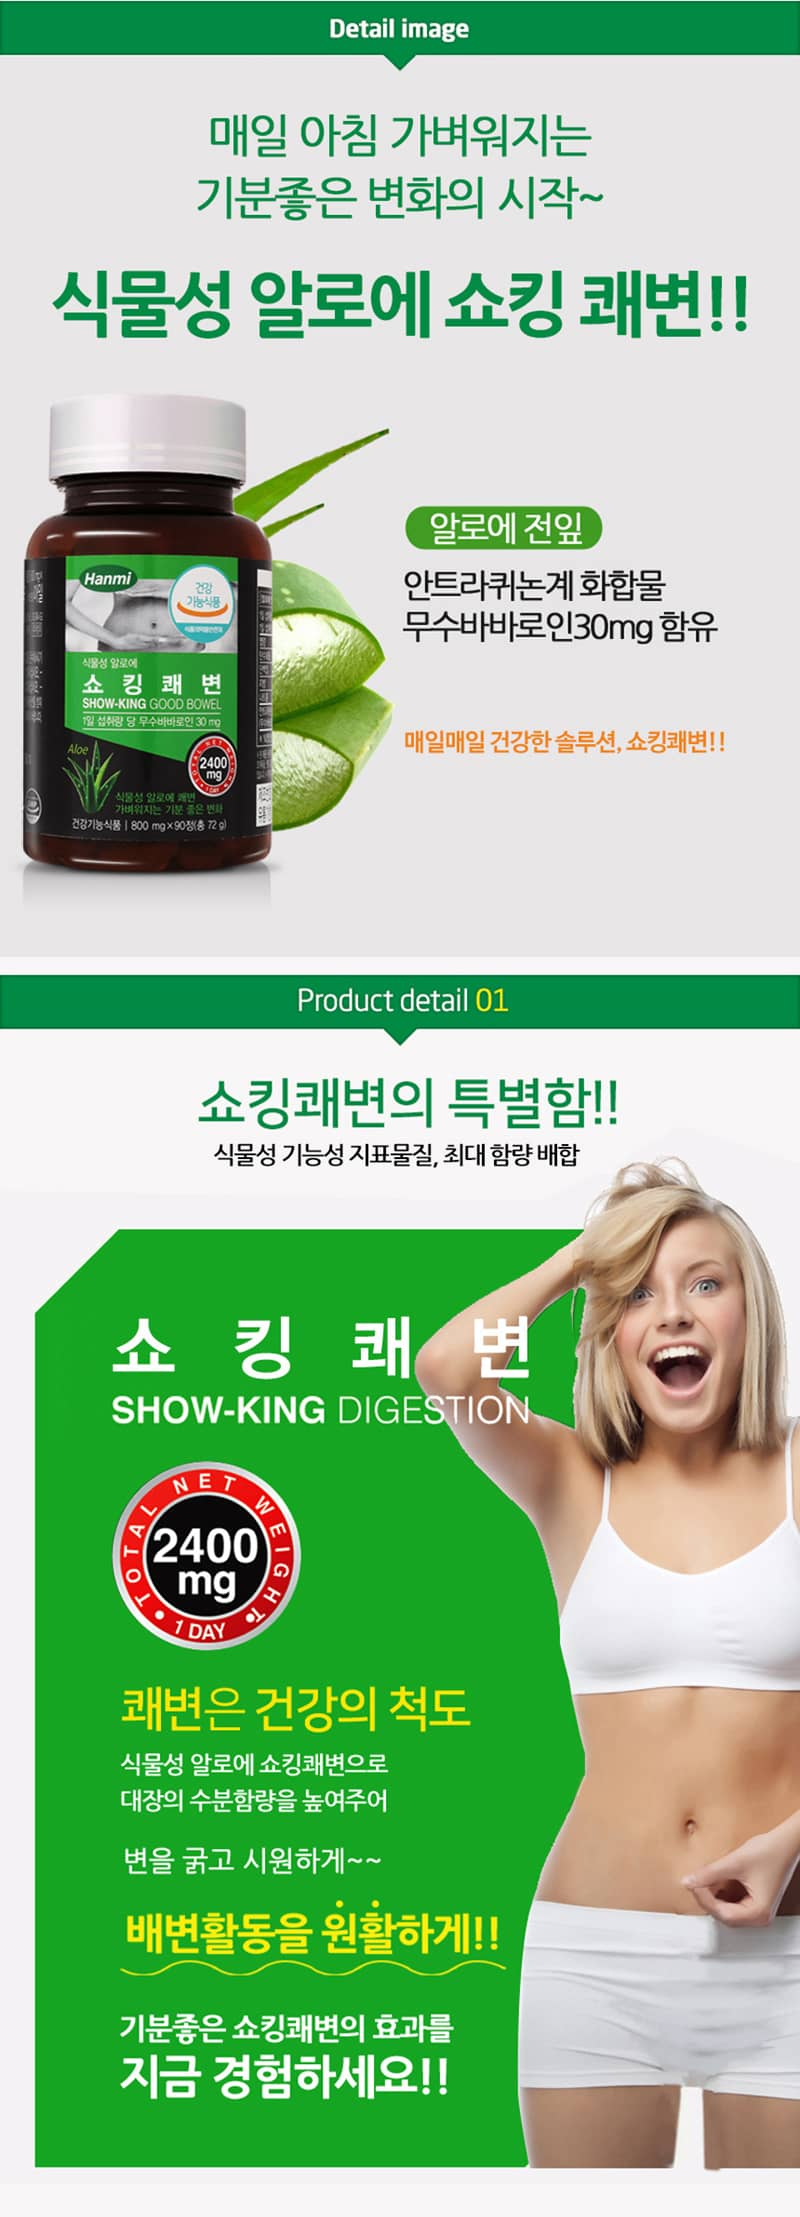 Hanmi-Showking_good_bowel_detail_800_1.jpg